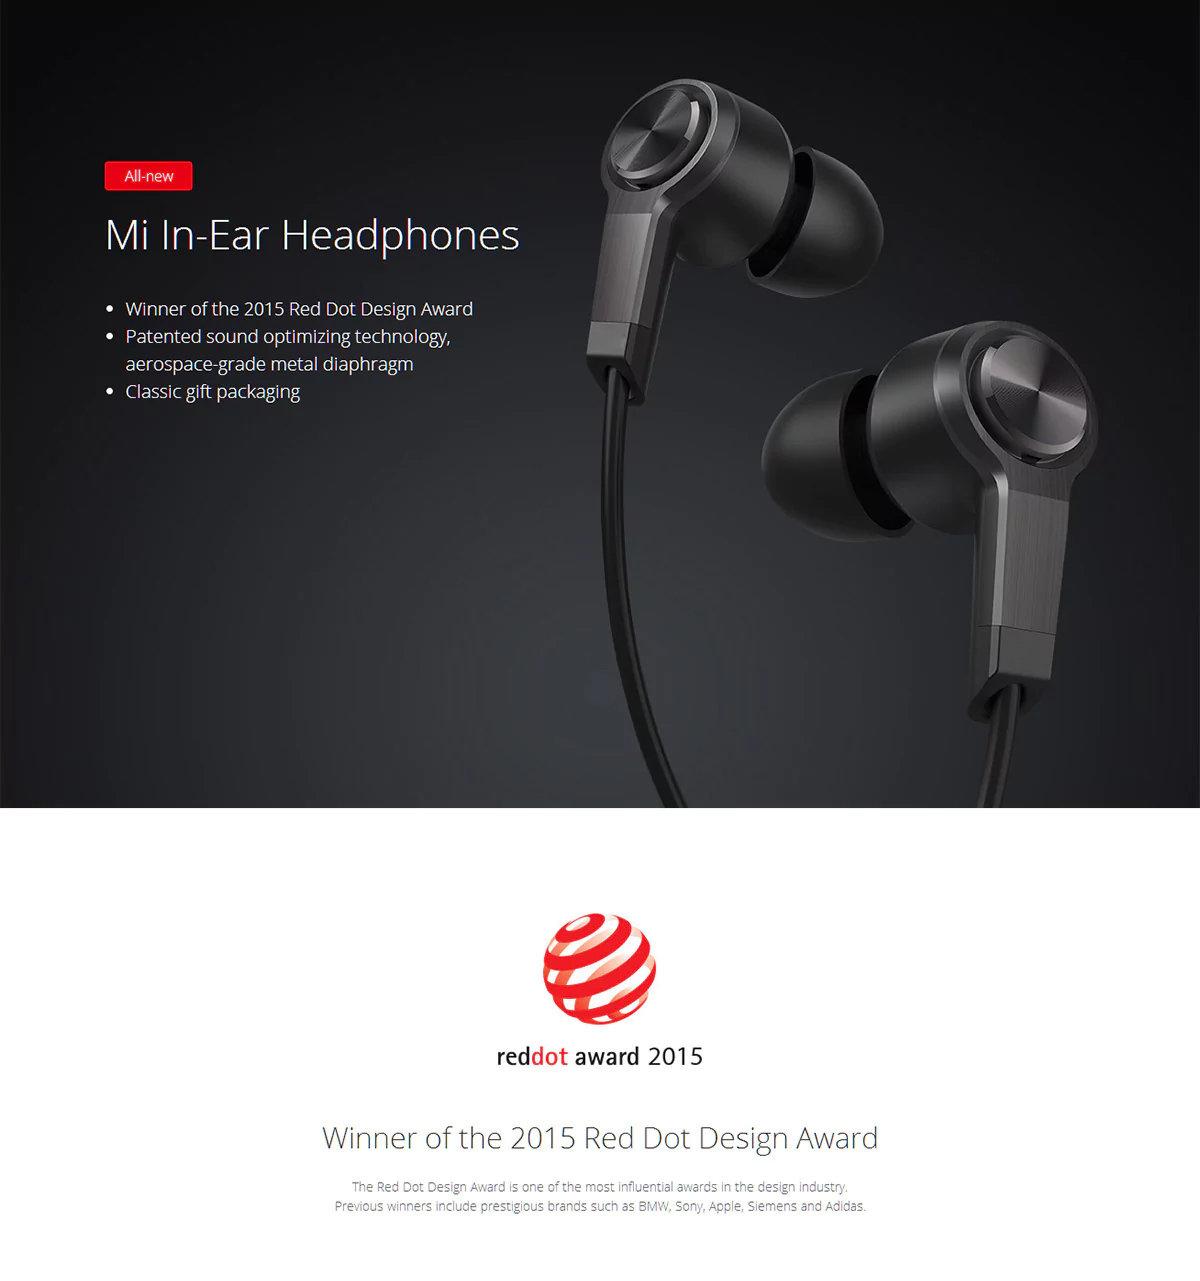 accessoires smartphones - Oreillettes XIAOMI Piston 3 Redot Design - 11